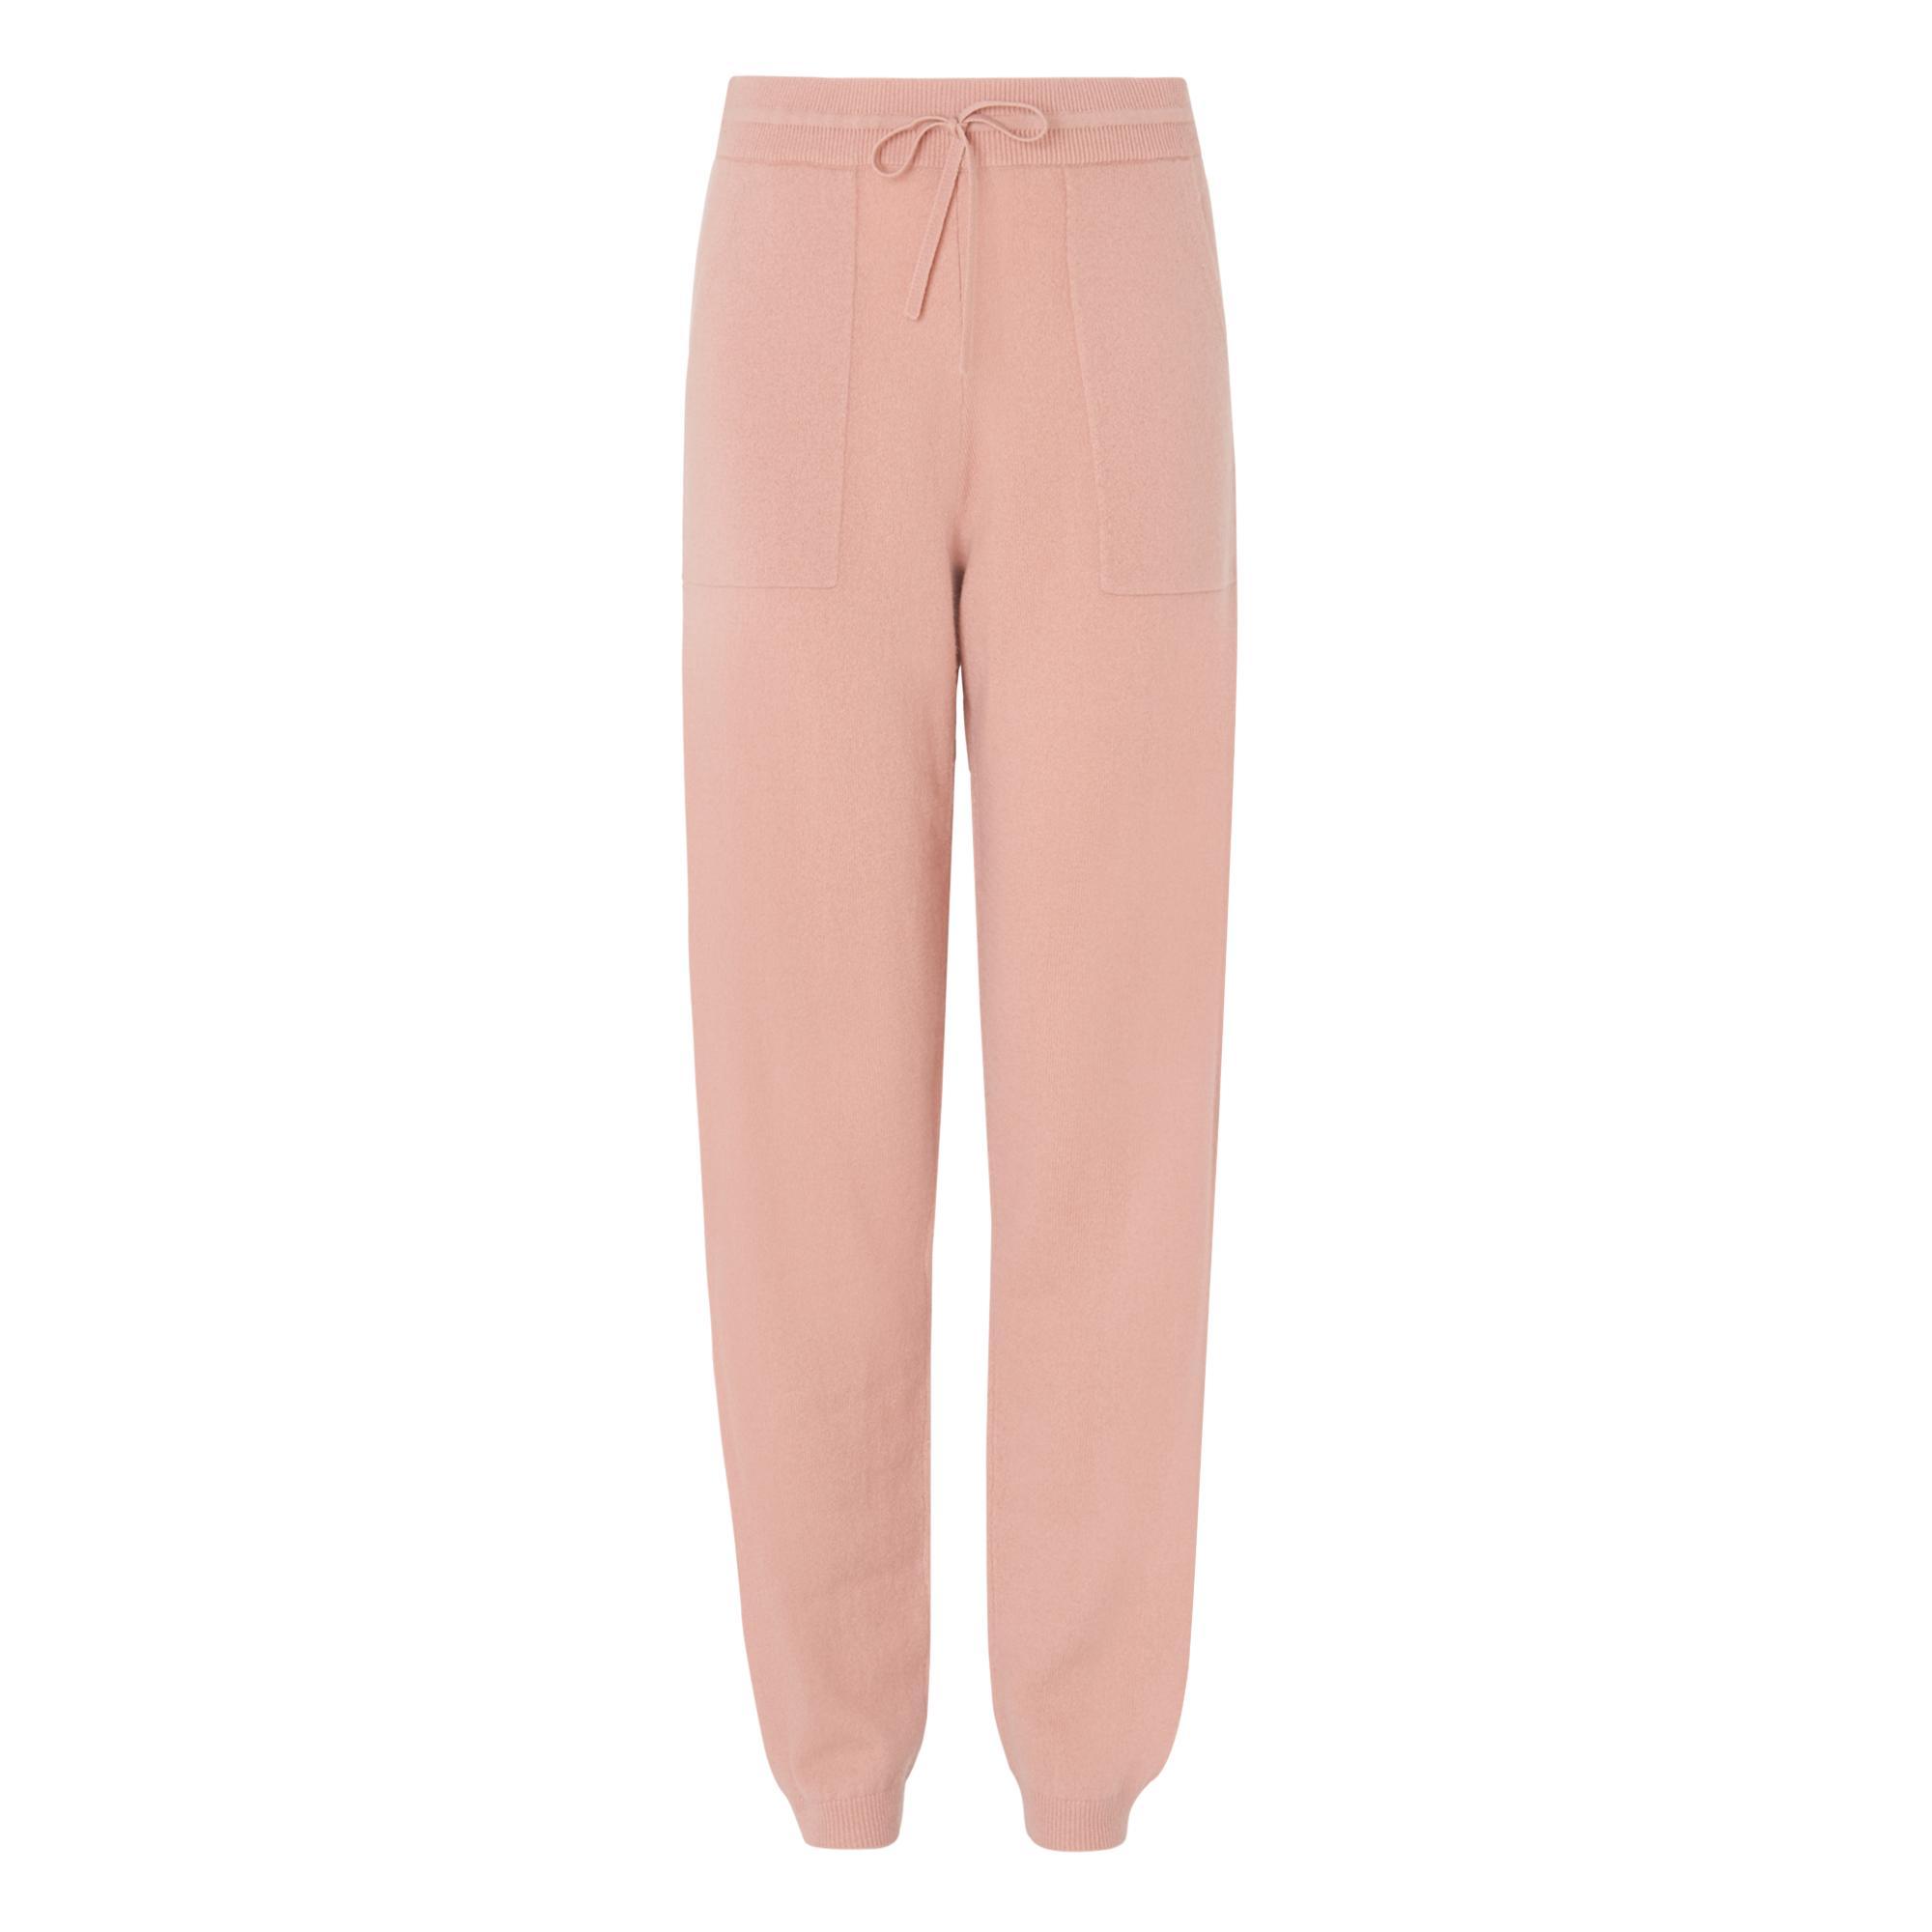 Mika Pink Pants